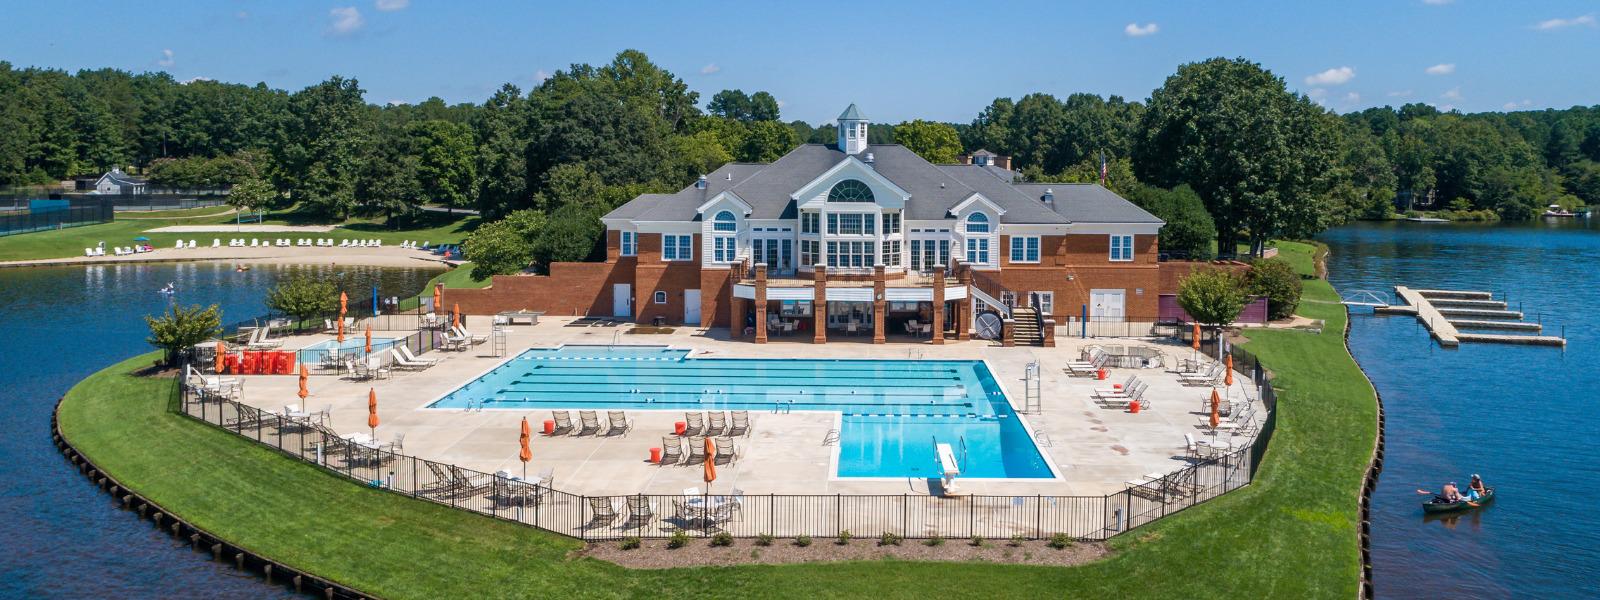 Fawn Lake   Virginia Retirement Communities   VA Gated Communities